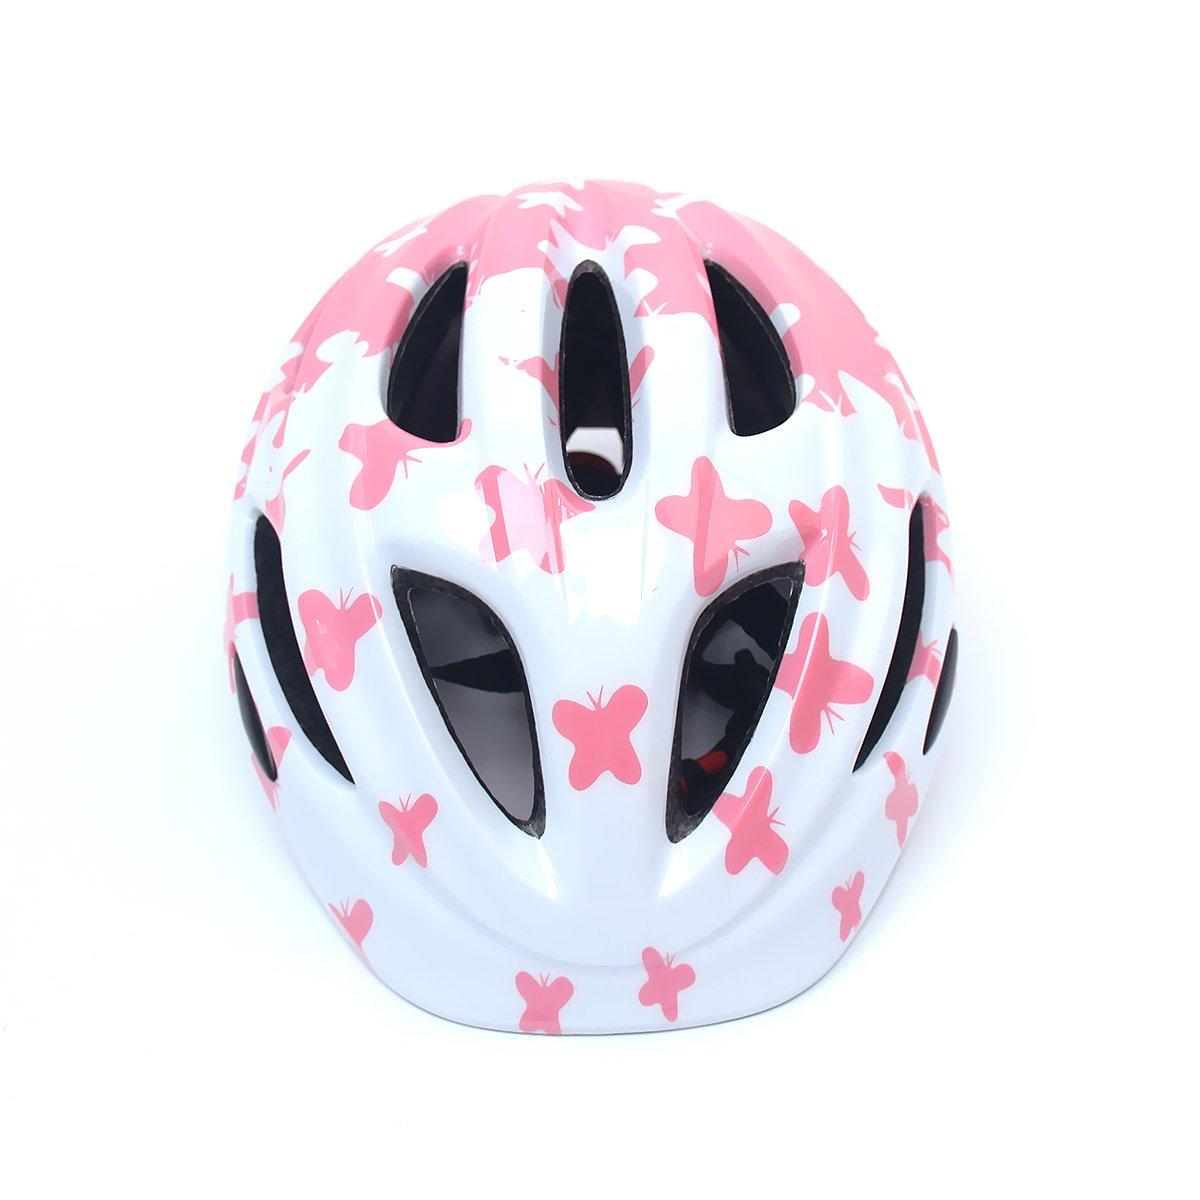 Blue KUYOU Toddler Bike Helmet . Multi-Sport Lightweight Safety Helmets for Cycling//Skateboard//Scooter//Skate Inline Skating//Rollerblading Protective Gear Suitable Boys//Girls 1-6 Year Old